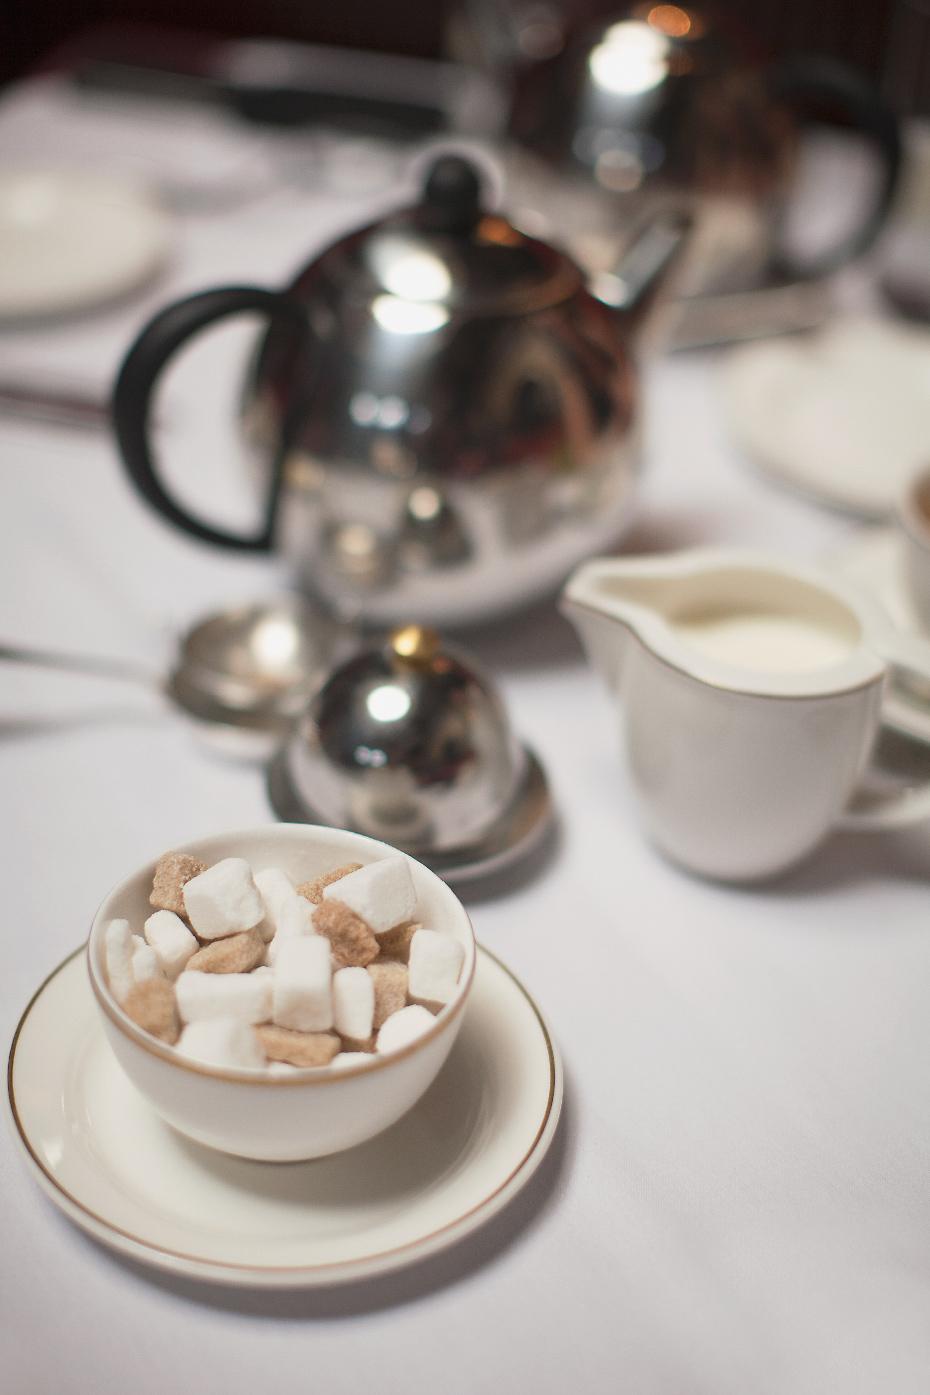 Stacey Van Berkel Photography I High Tea at the historic Merchant Hotel I Belfast, Northern Ireland